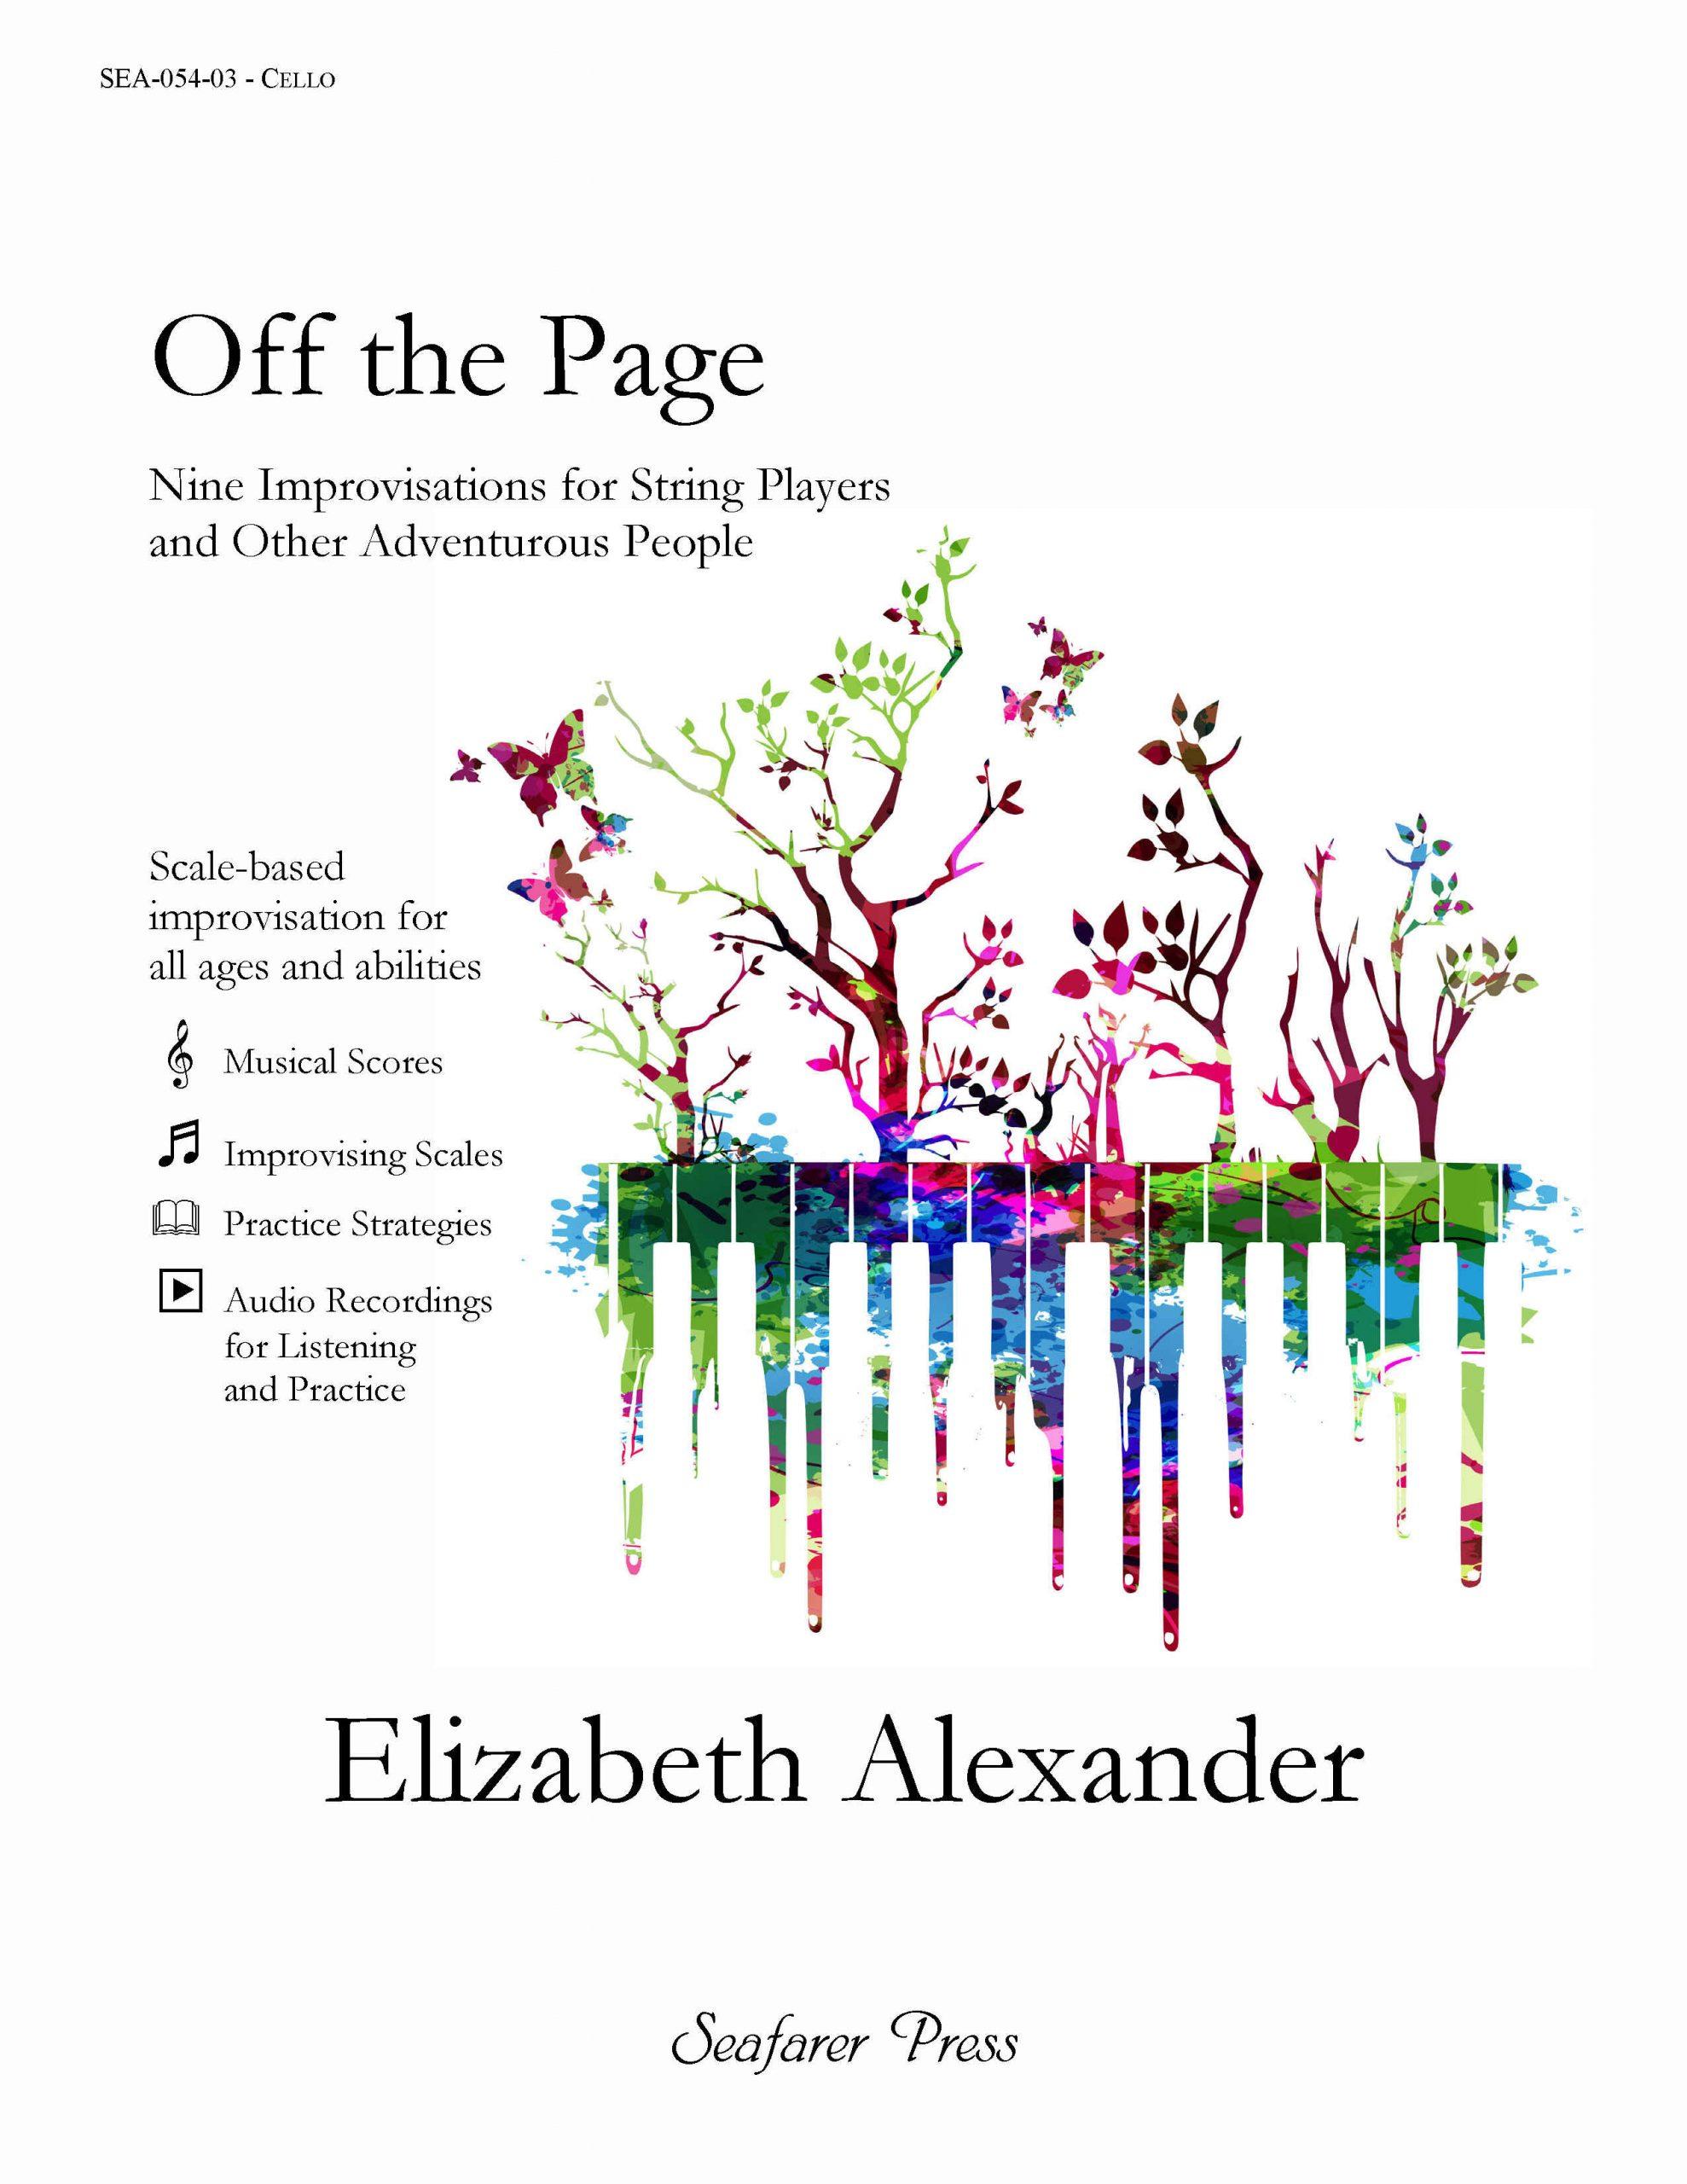 SEA-054-03BUN - Off the Page